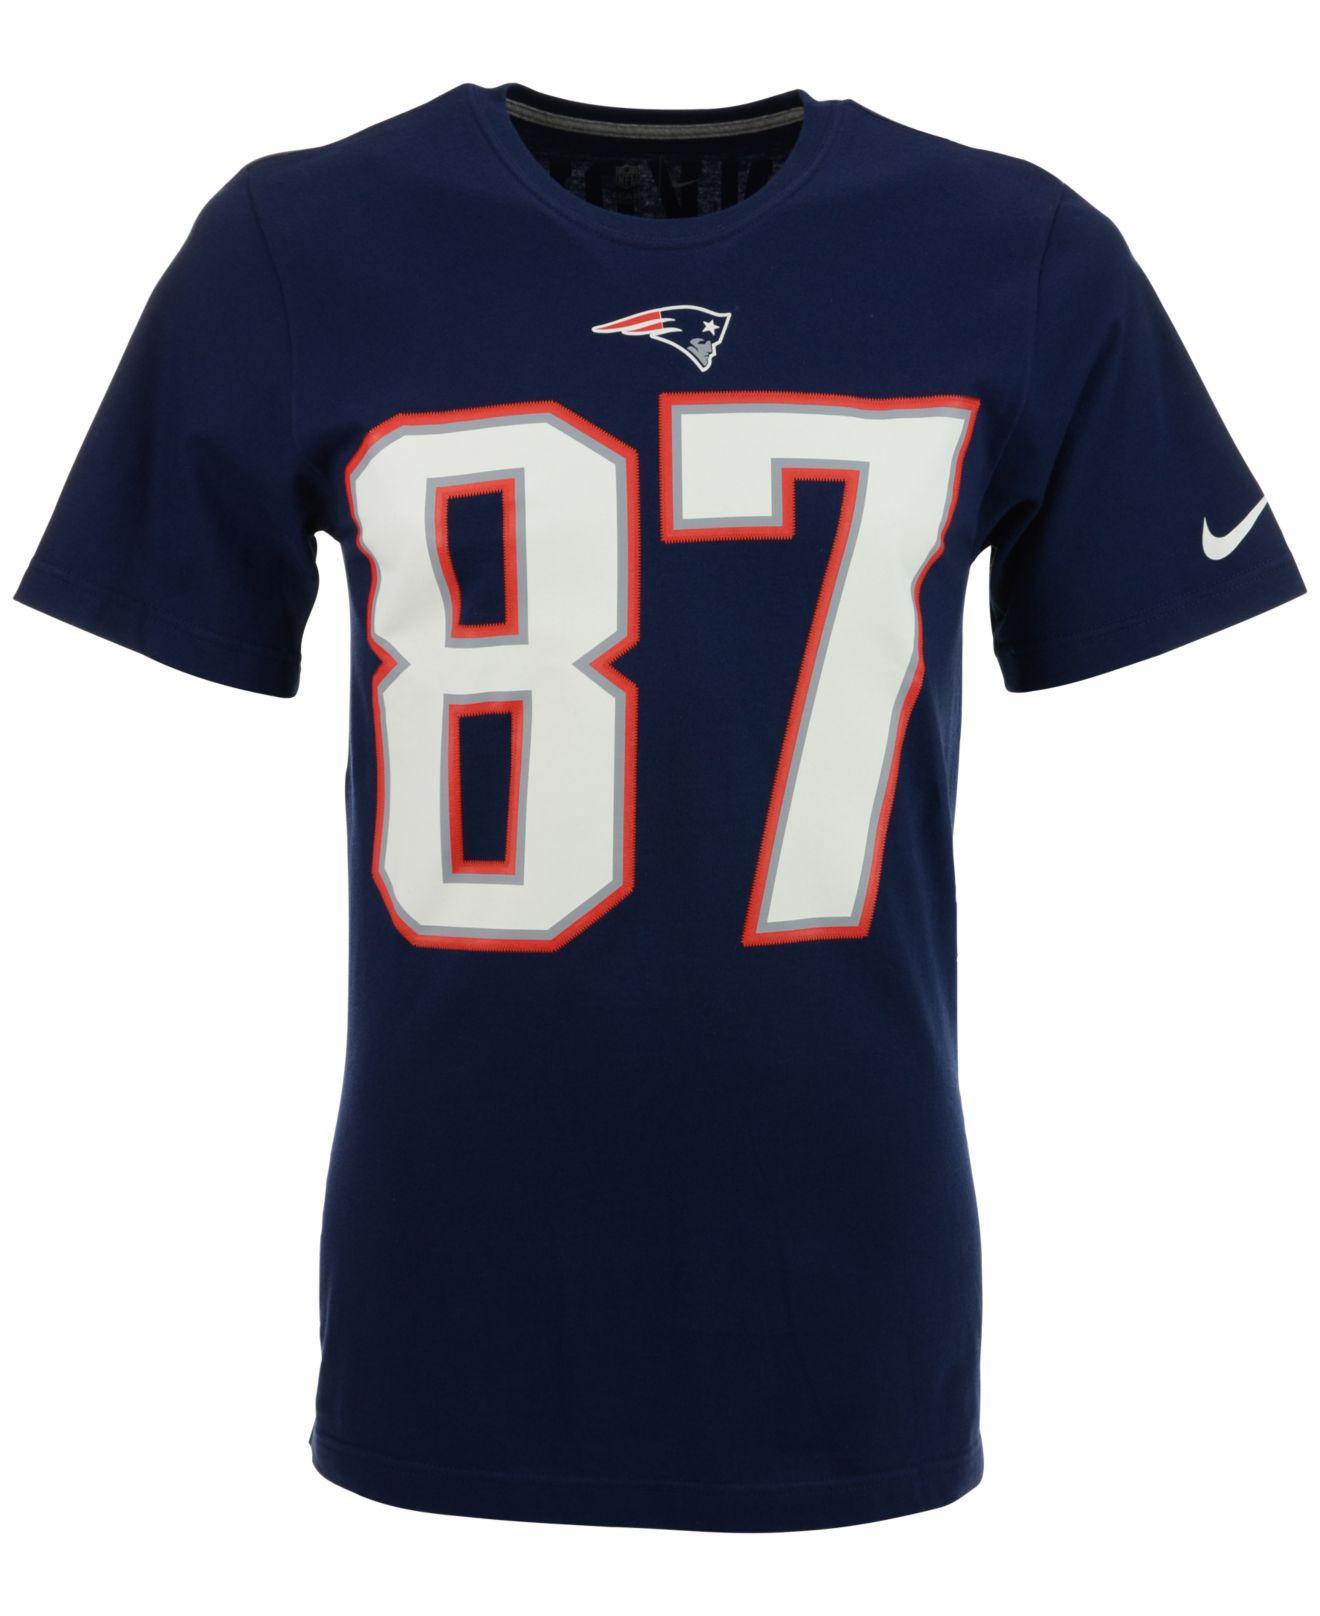 Lyst - Nike Men s Short-sleeve Rob Gronkowski New England Patriots Player T- shirt in Blue for Men 207d951b6